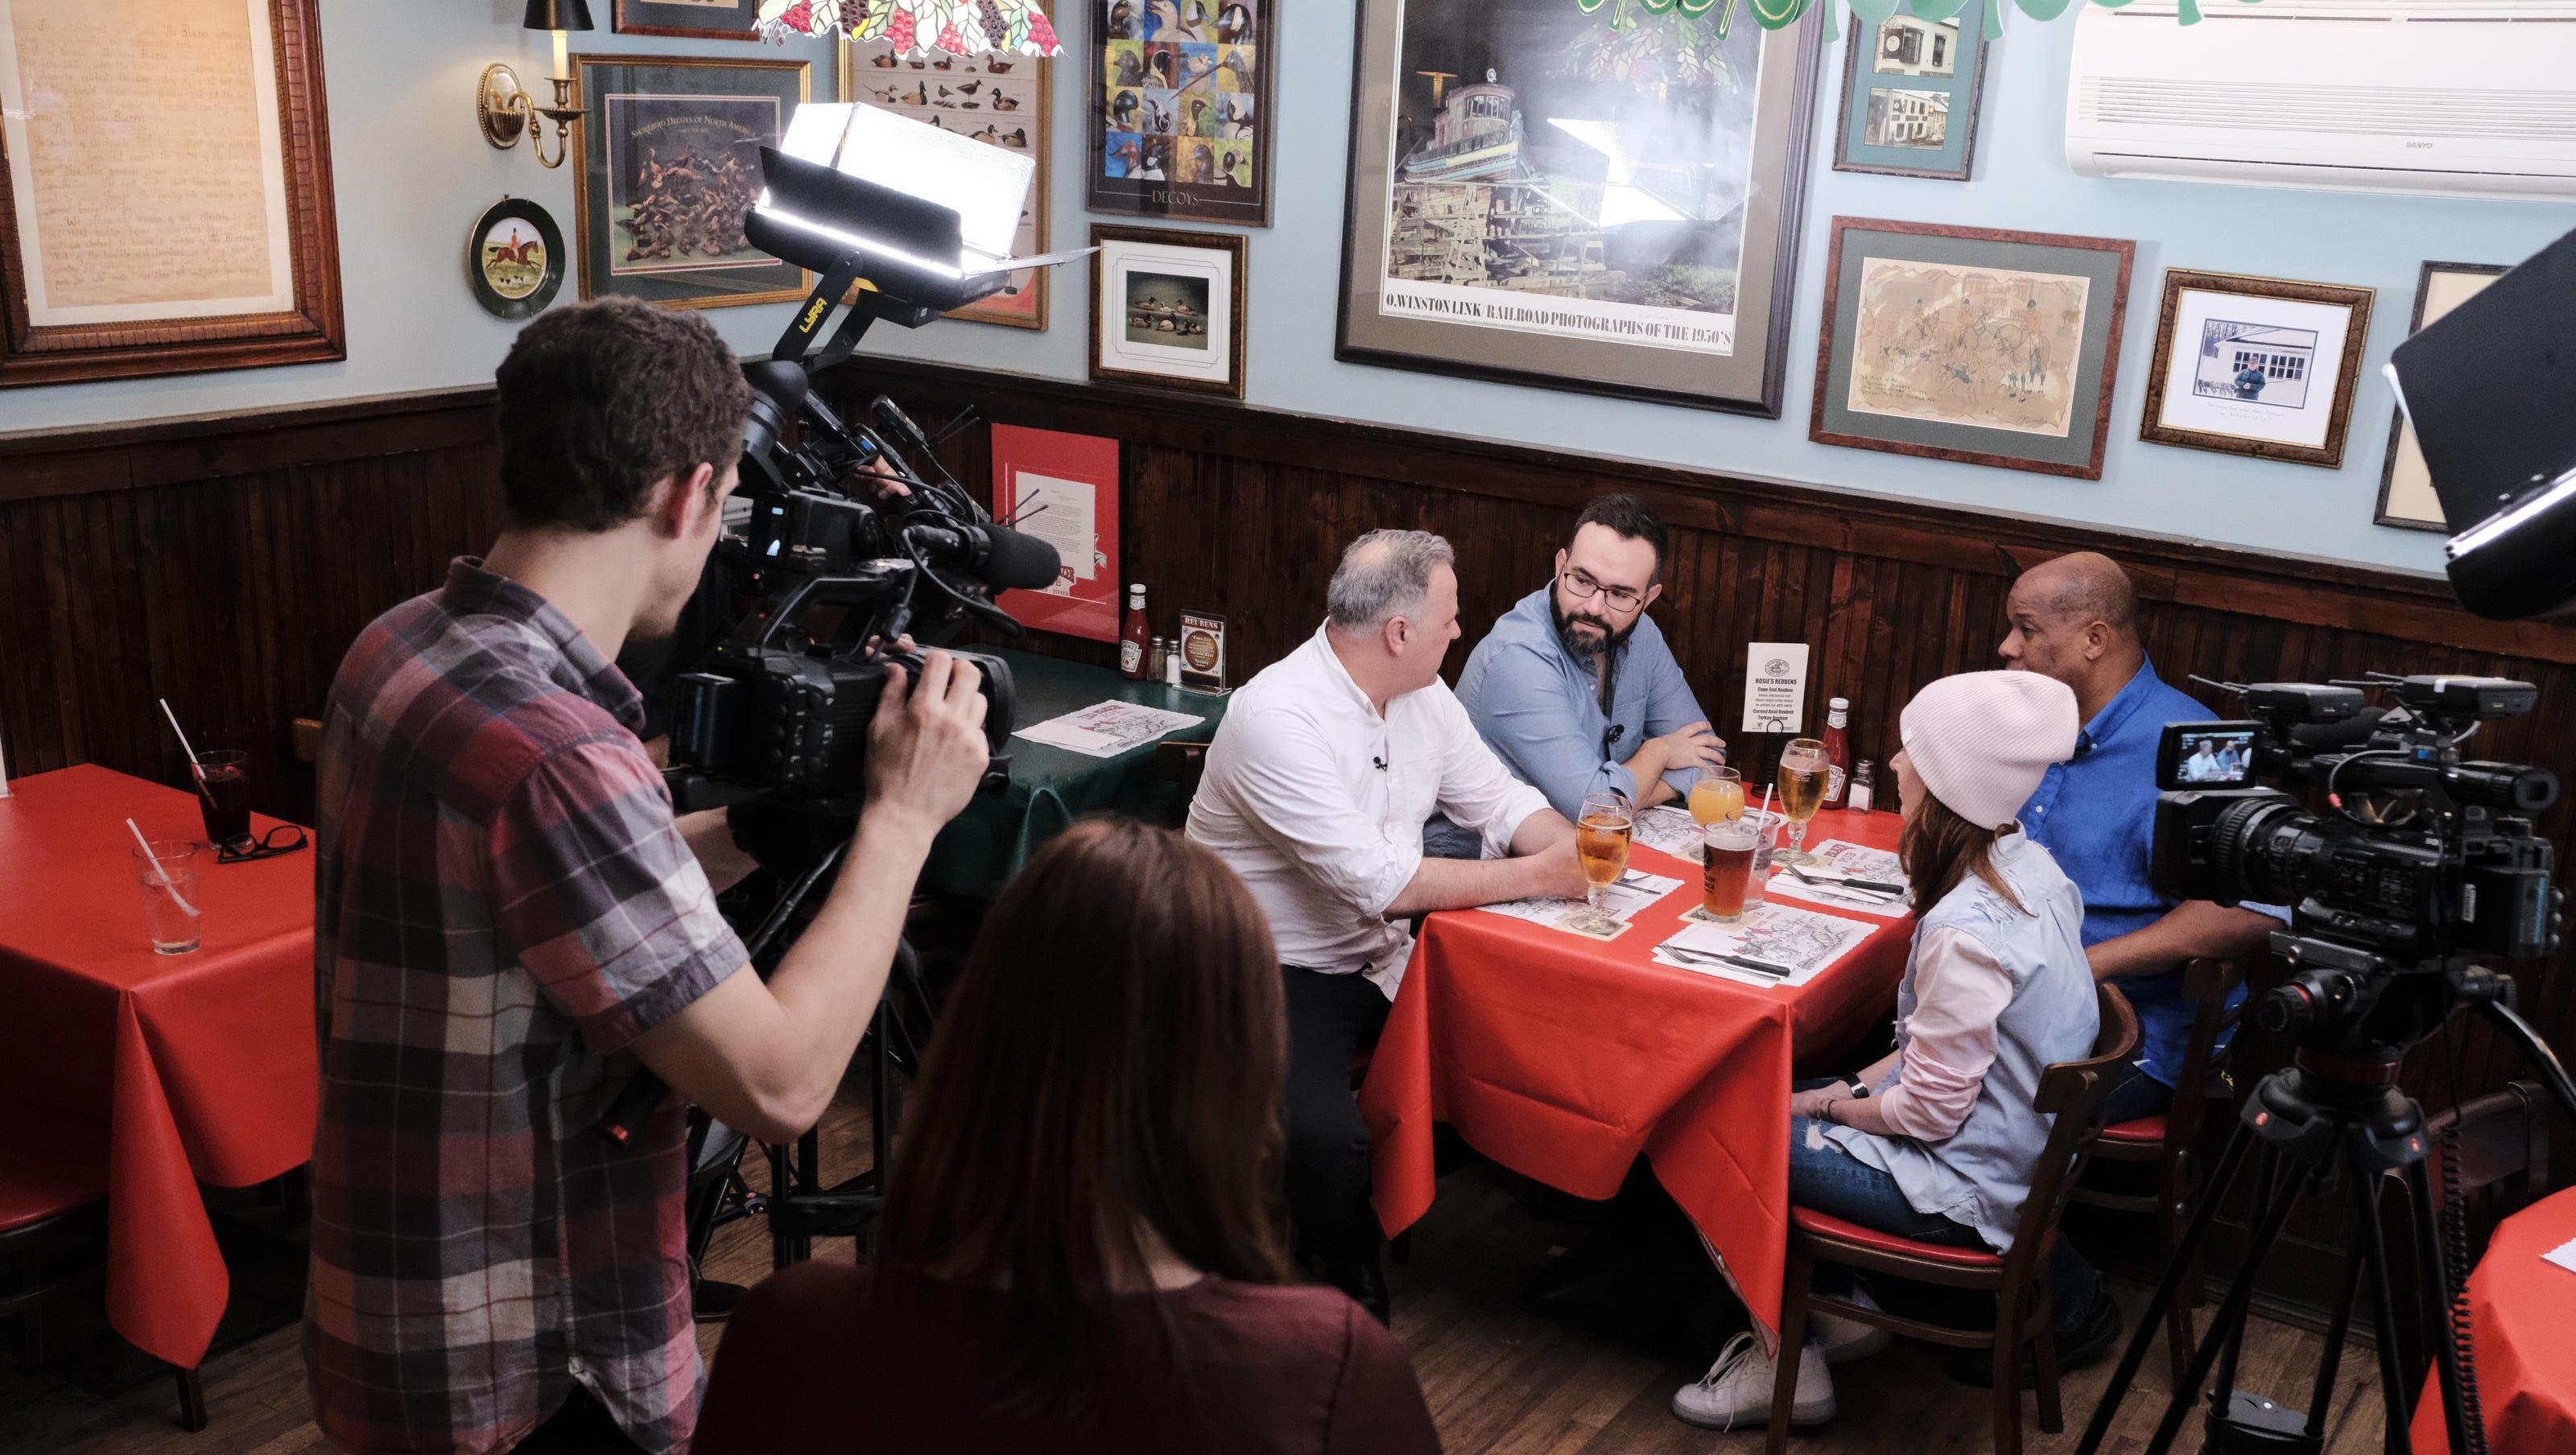 North Salem Restaurant wins 'best burger' accolades